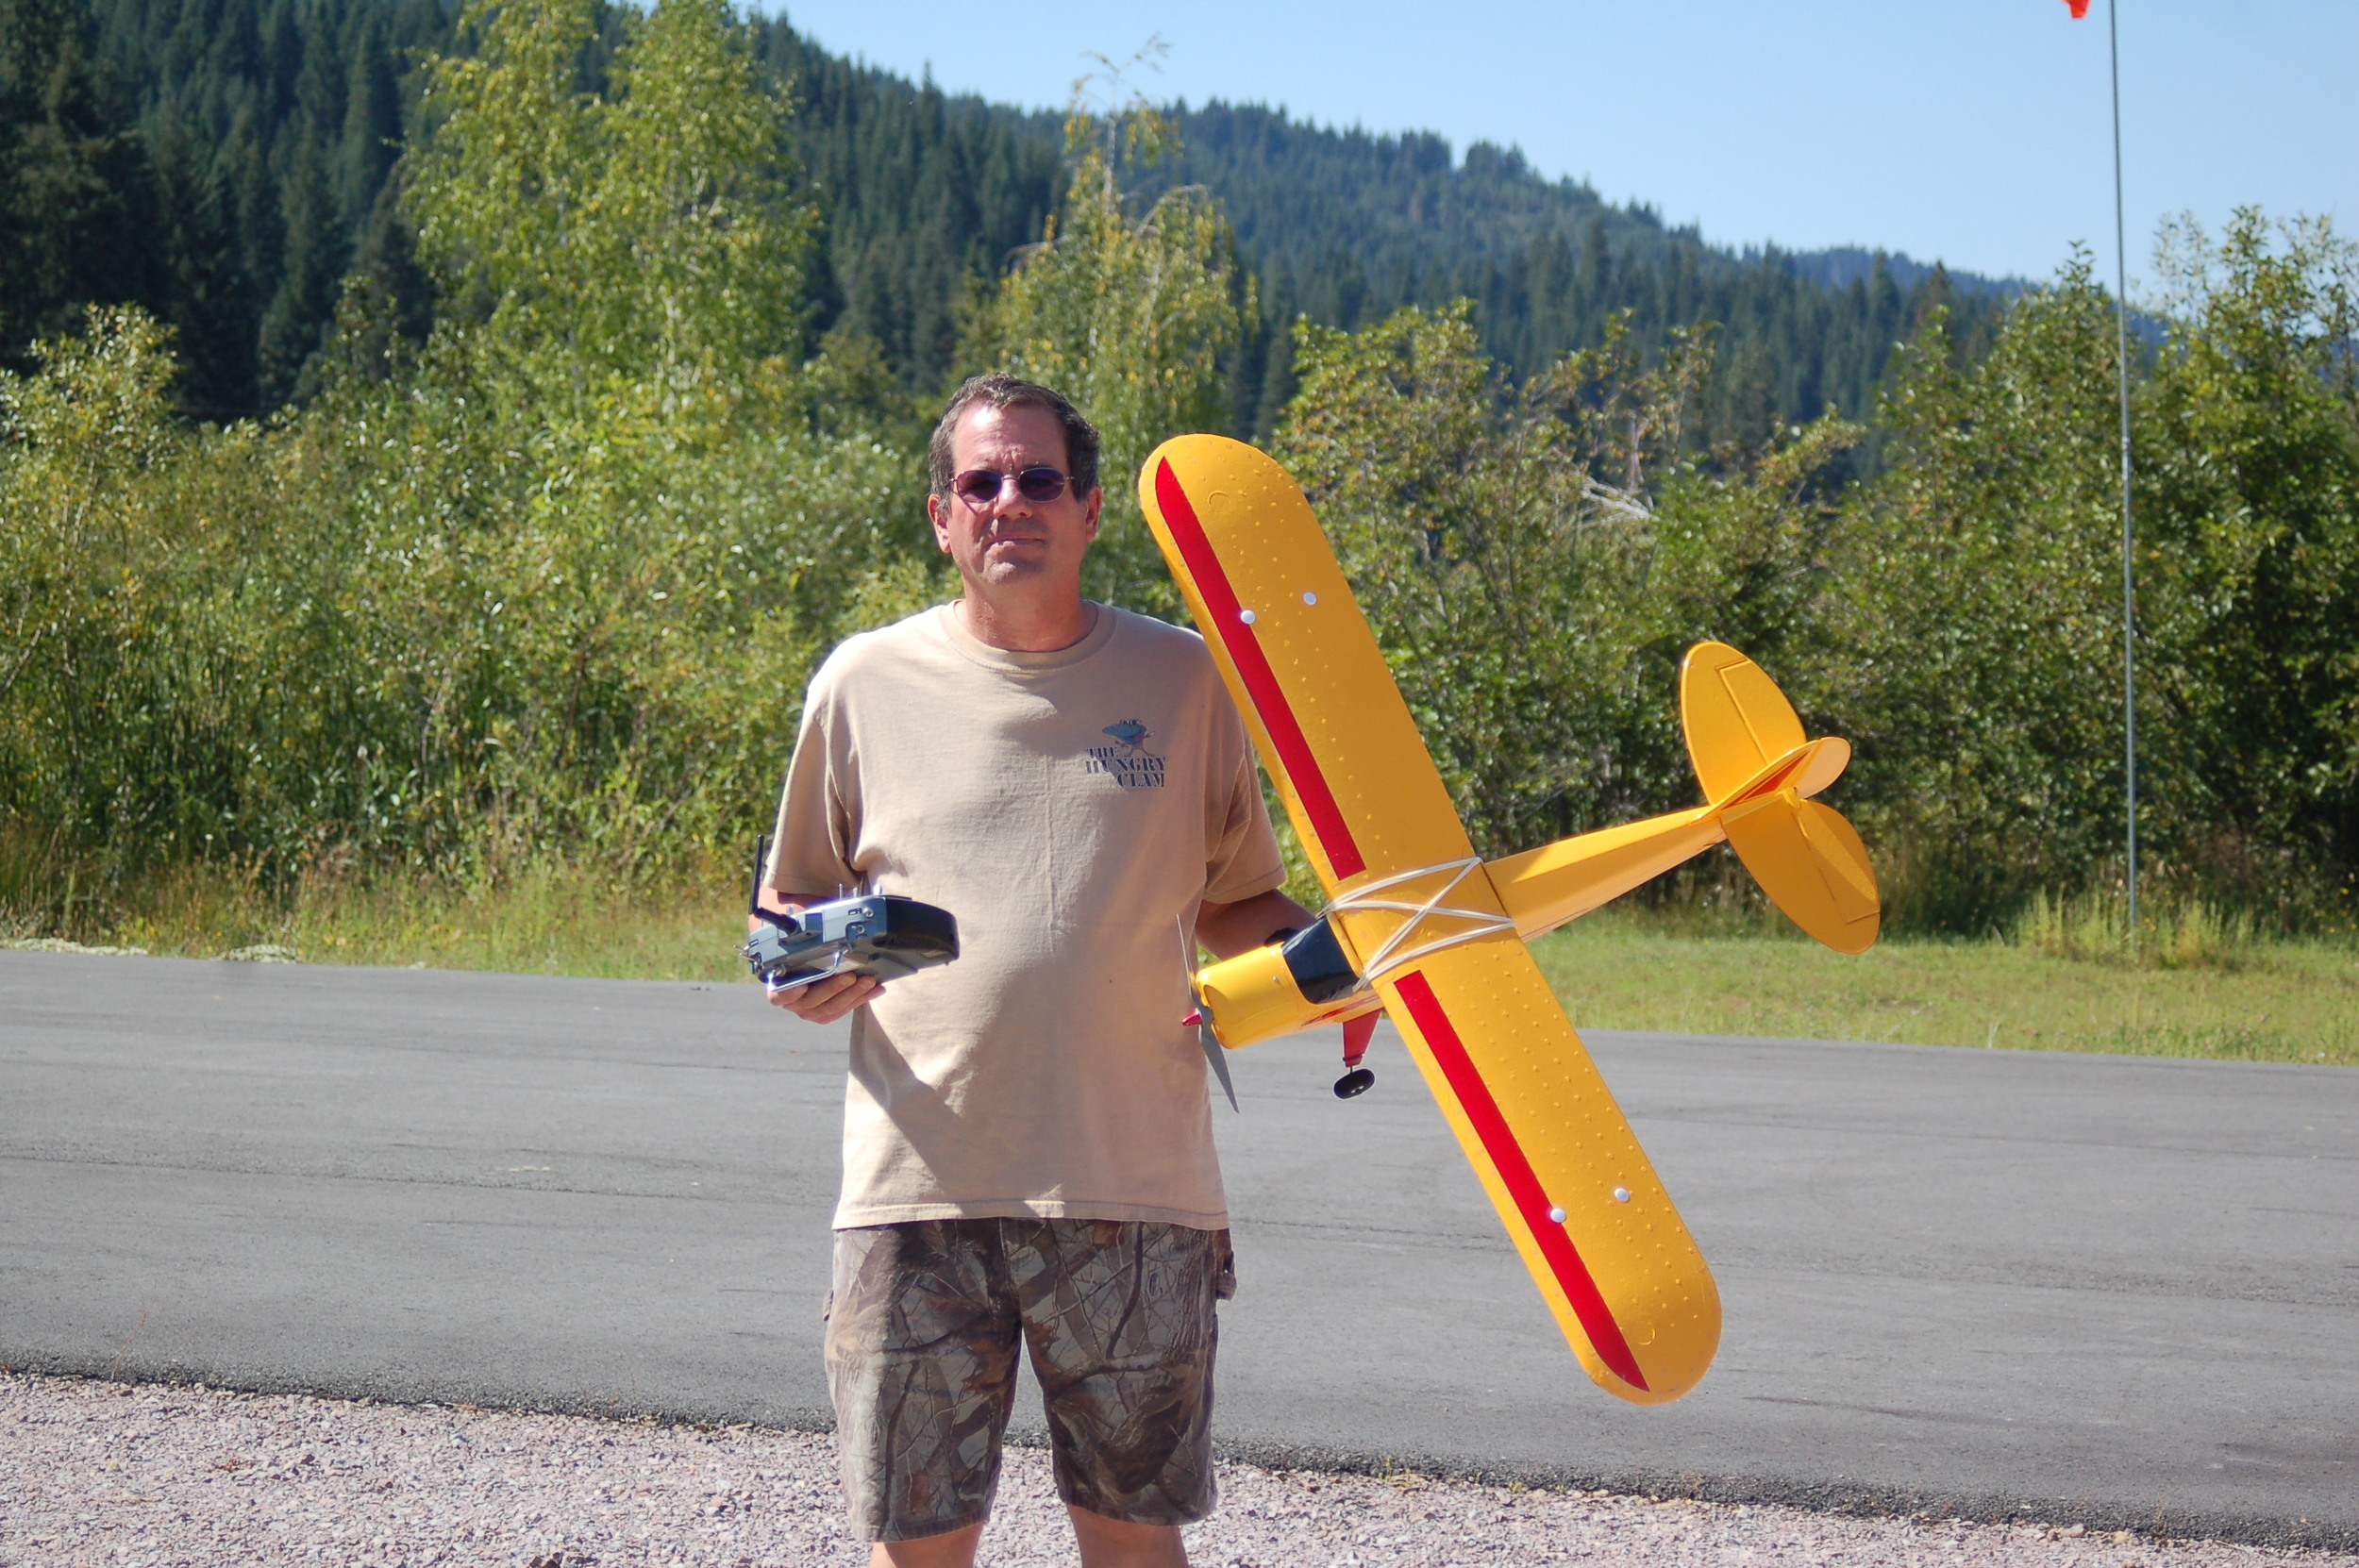 plane man1.jpg